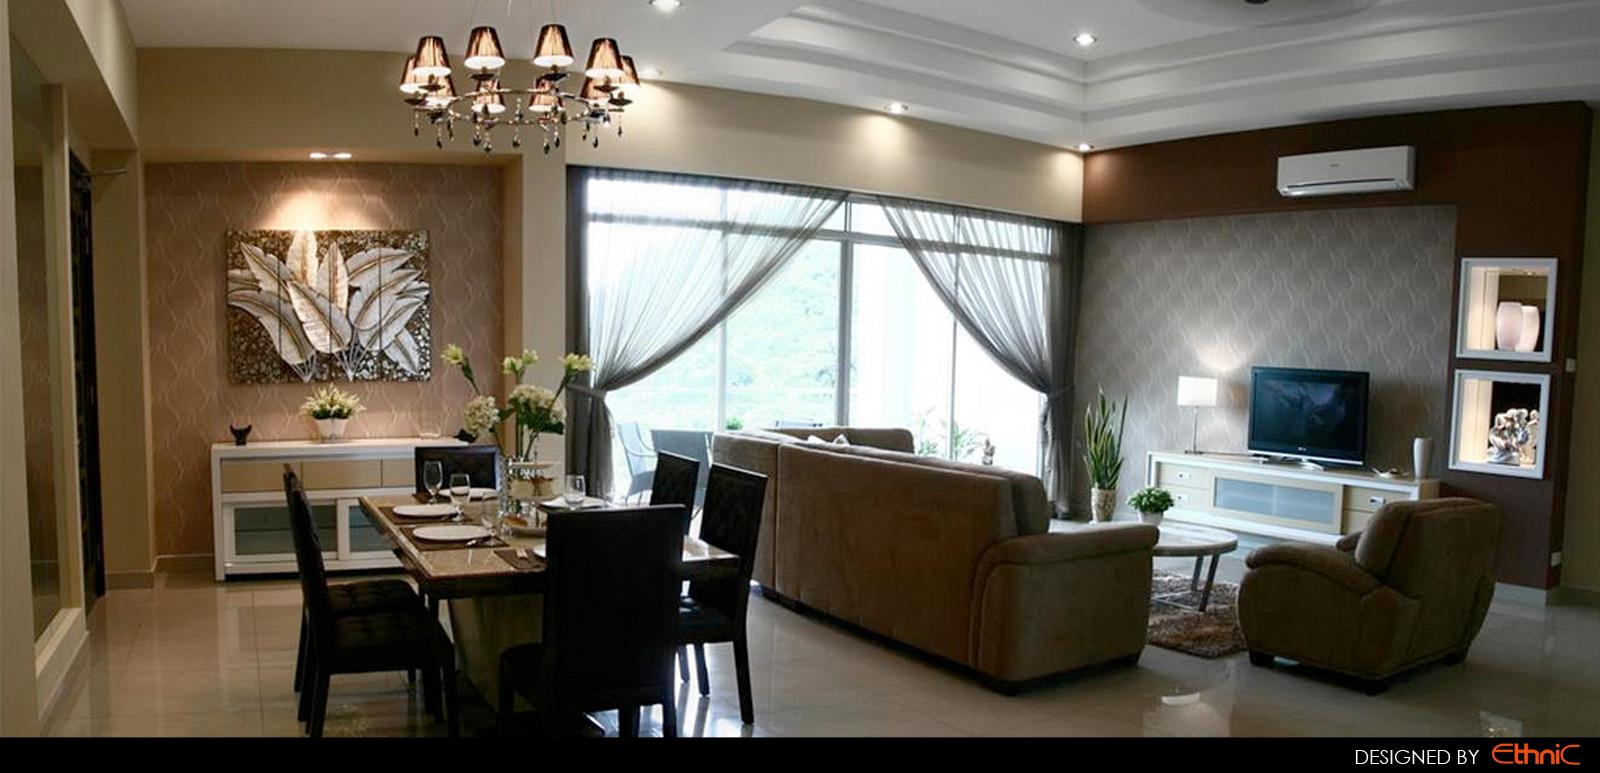 Ethnic Penang Interior Design And Furniture NICK CHAN DOT NET